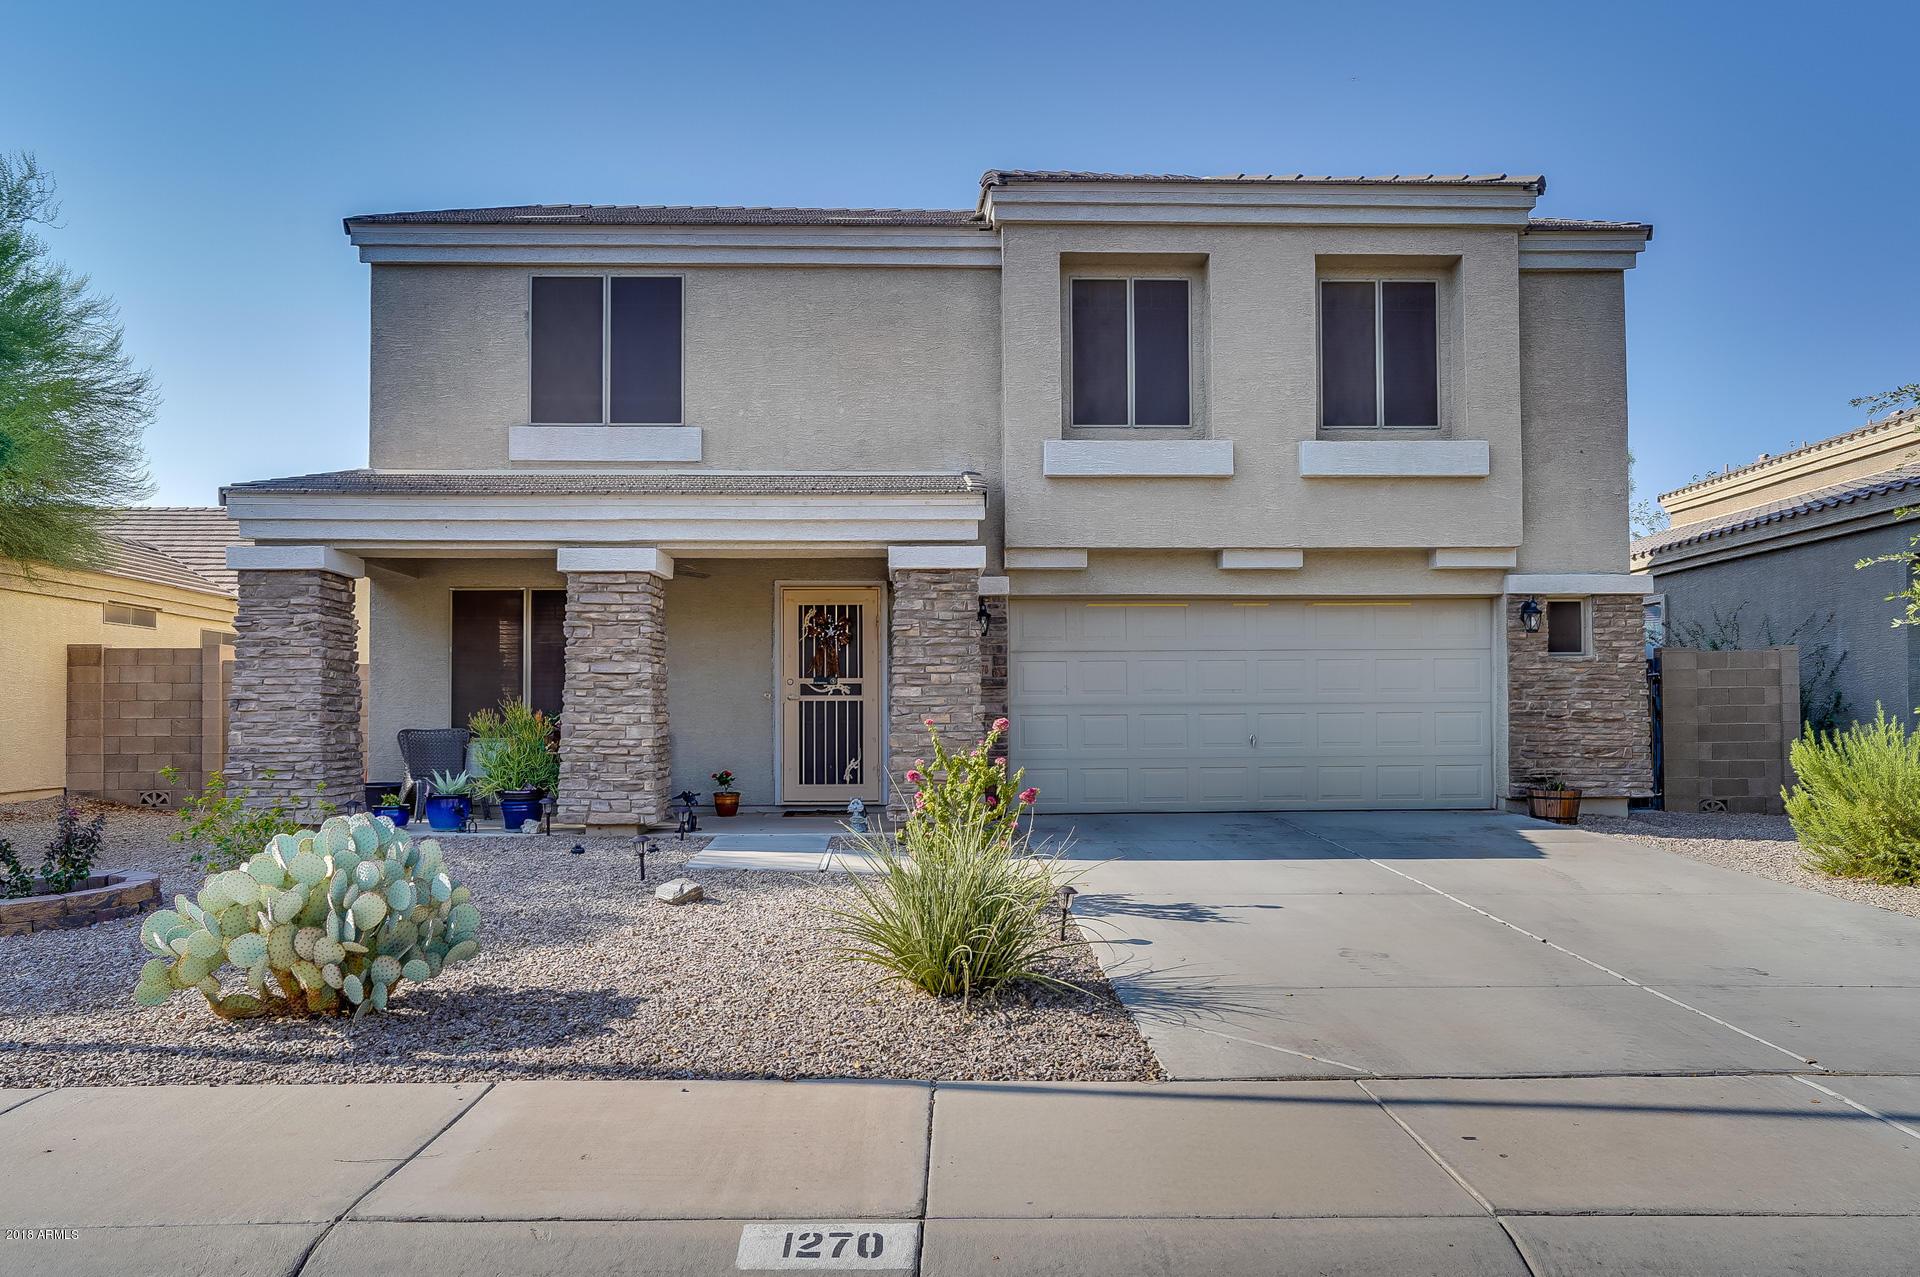 Photo for 1270 W Castle Drive, Casa Grande, AZ 85122 (MLS # 5806989)